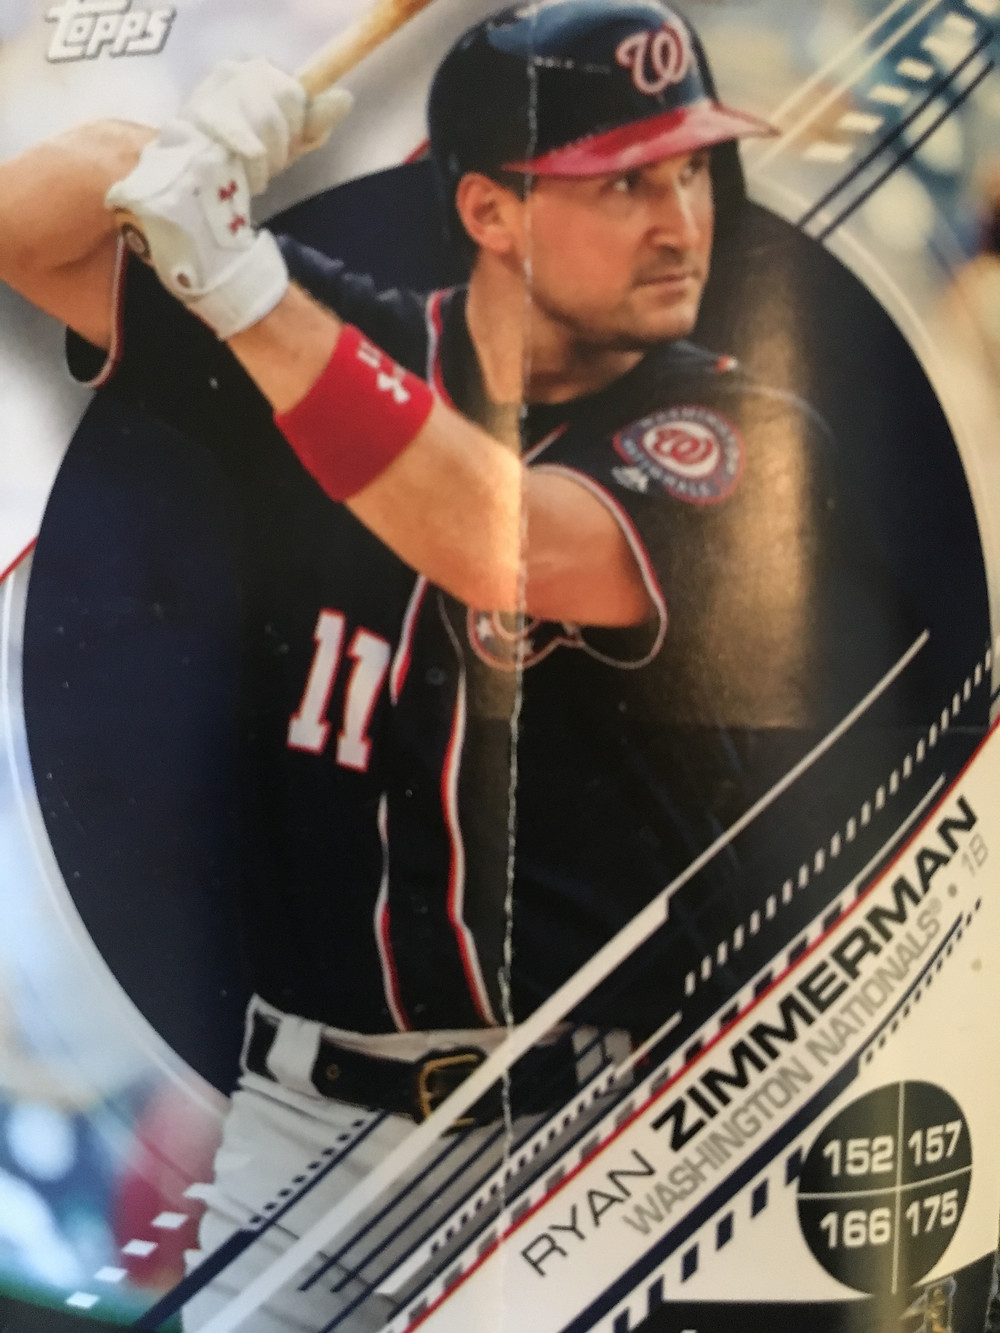 Ryan Zimmerman Topps sticker card, 2019.